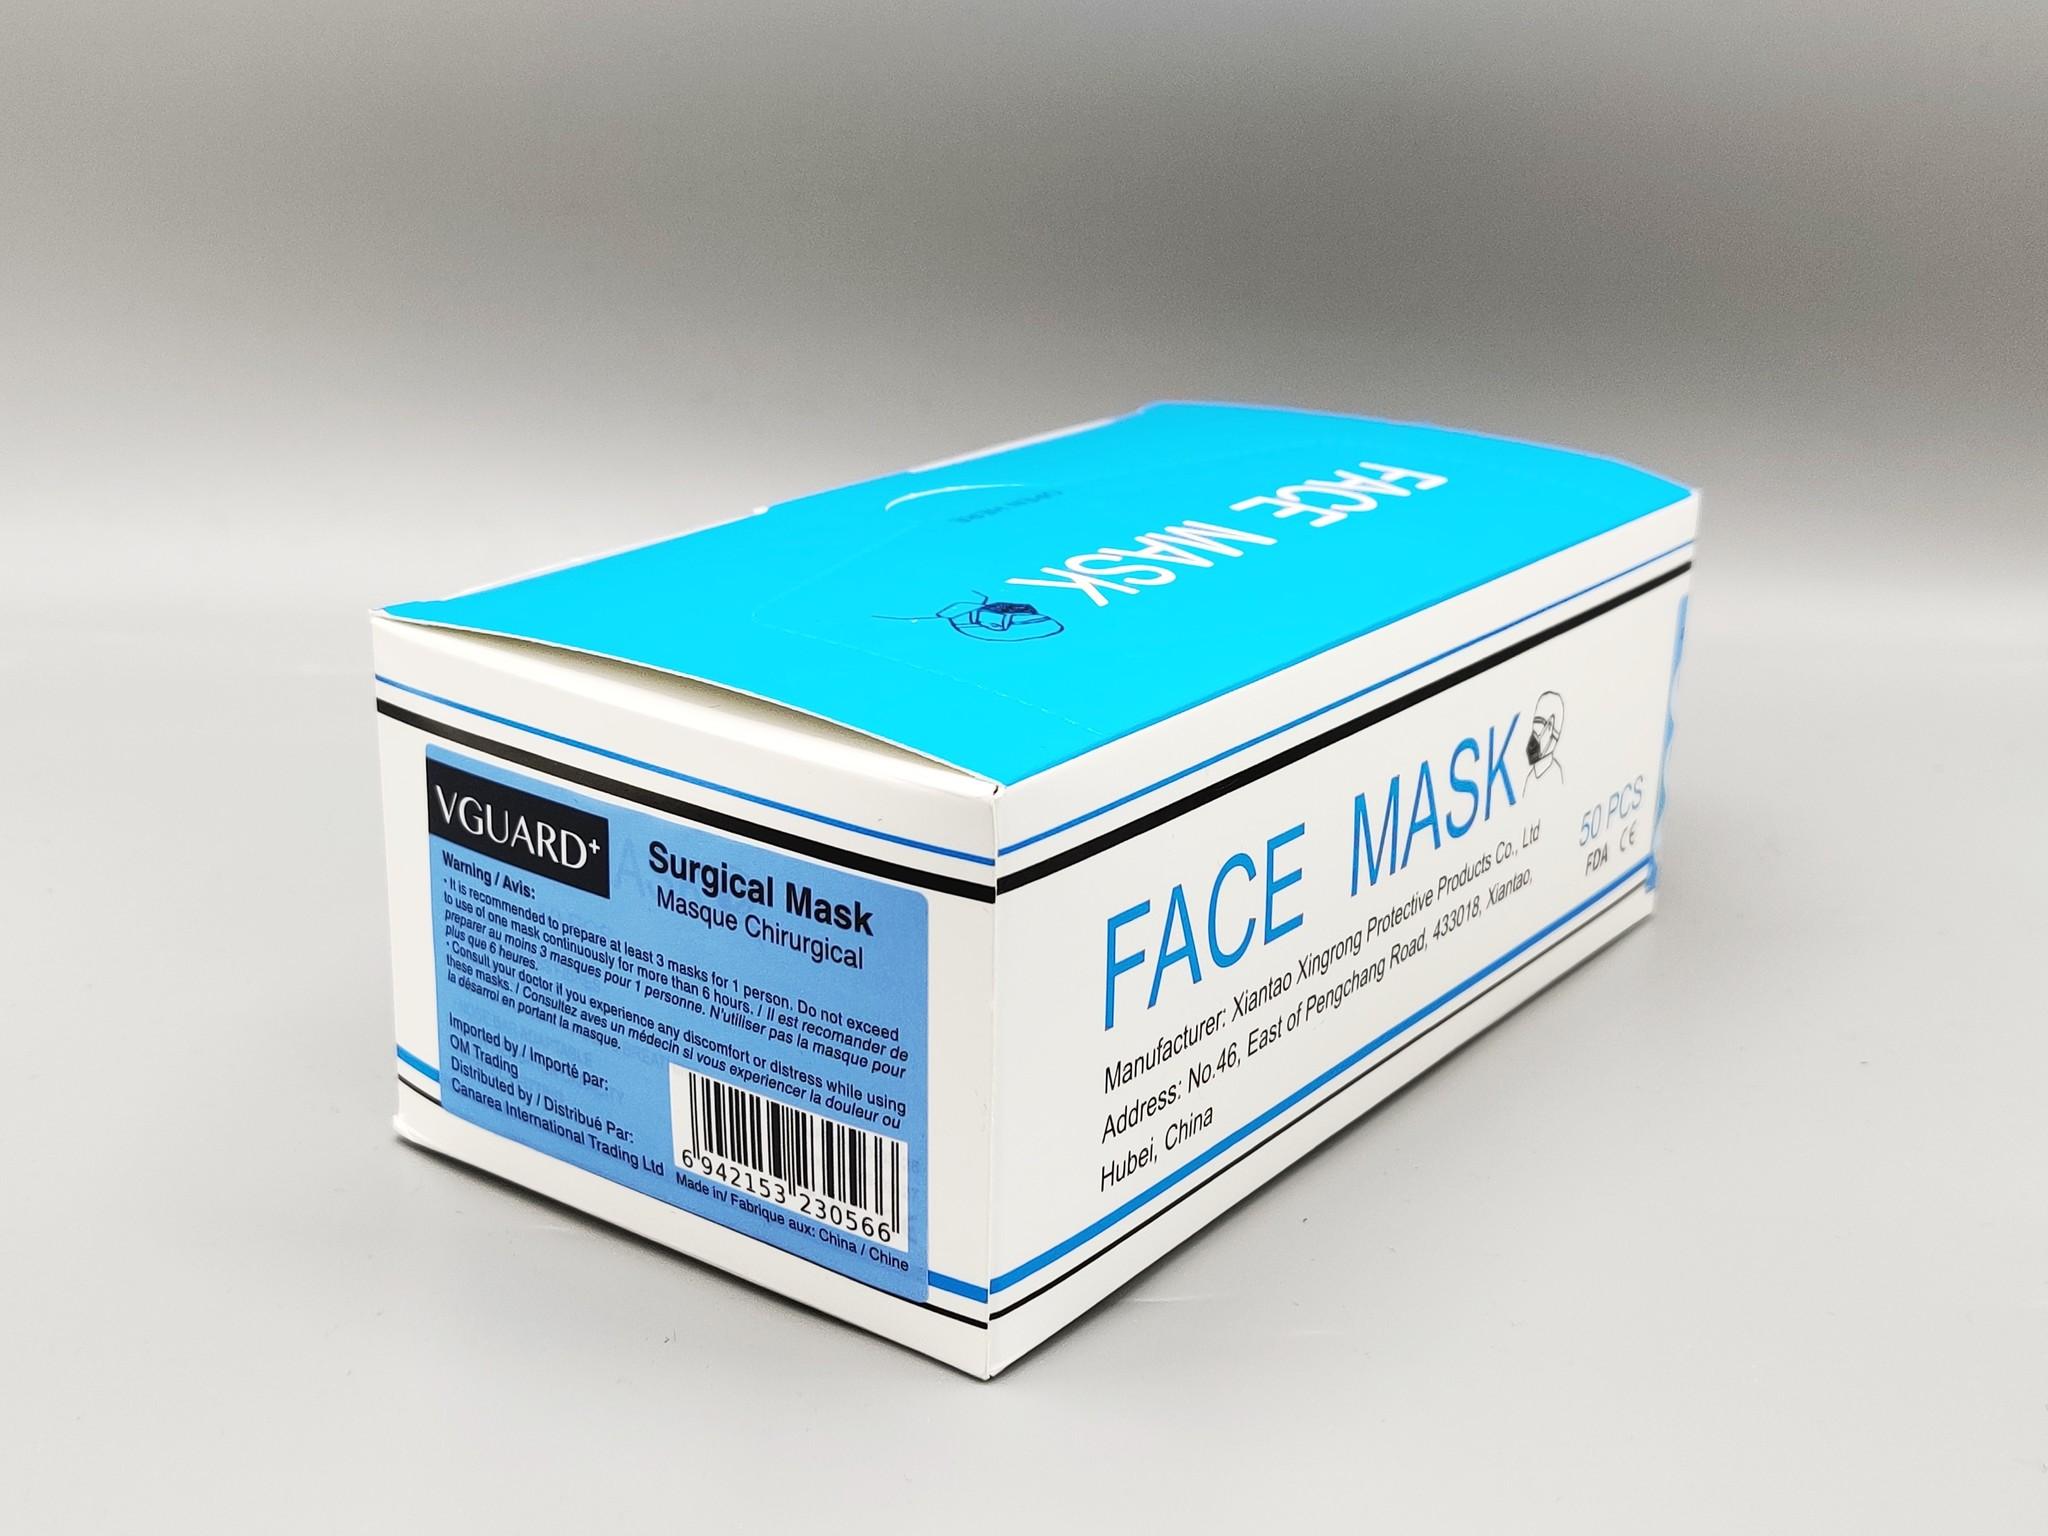 VGUARD VGUARD Surgical Mask - Box of 50